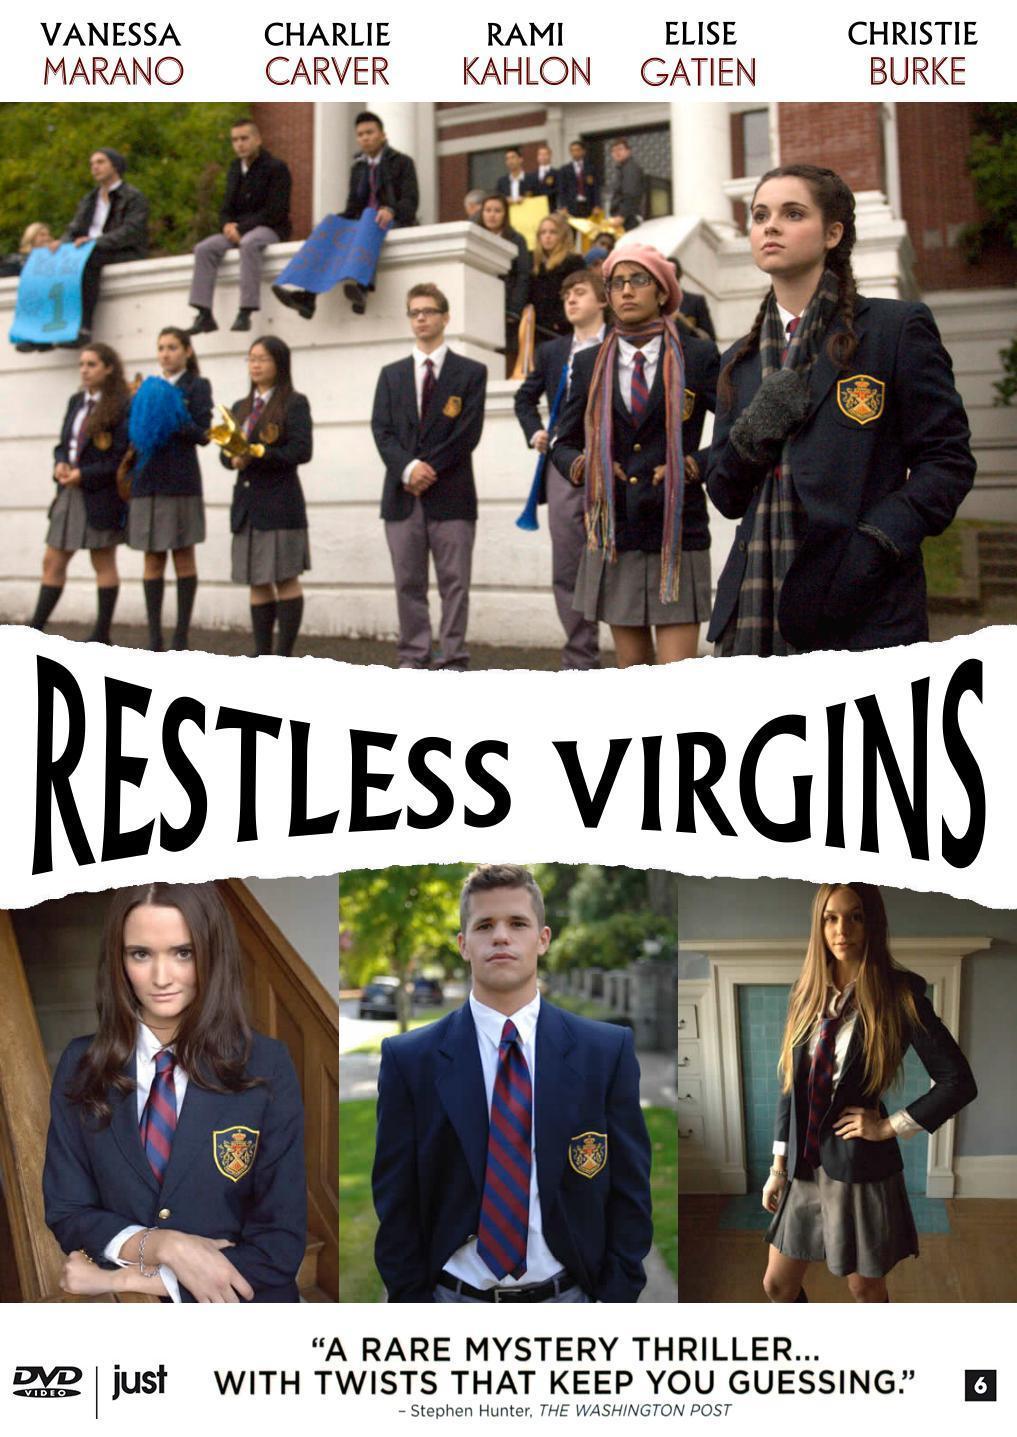 Restless Virgins (2013)